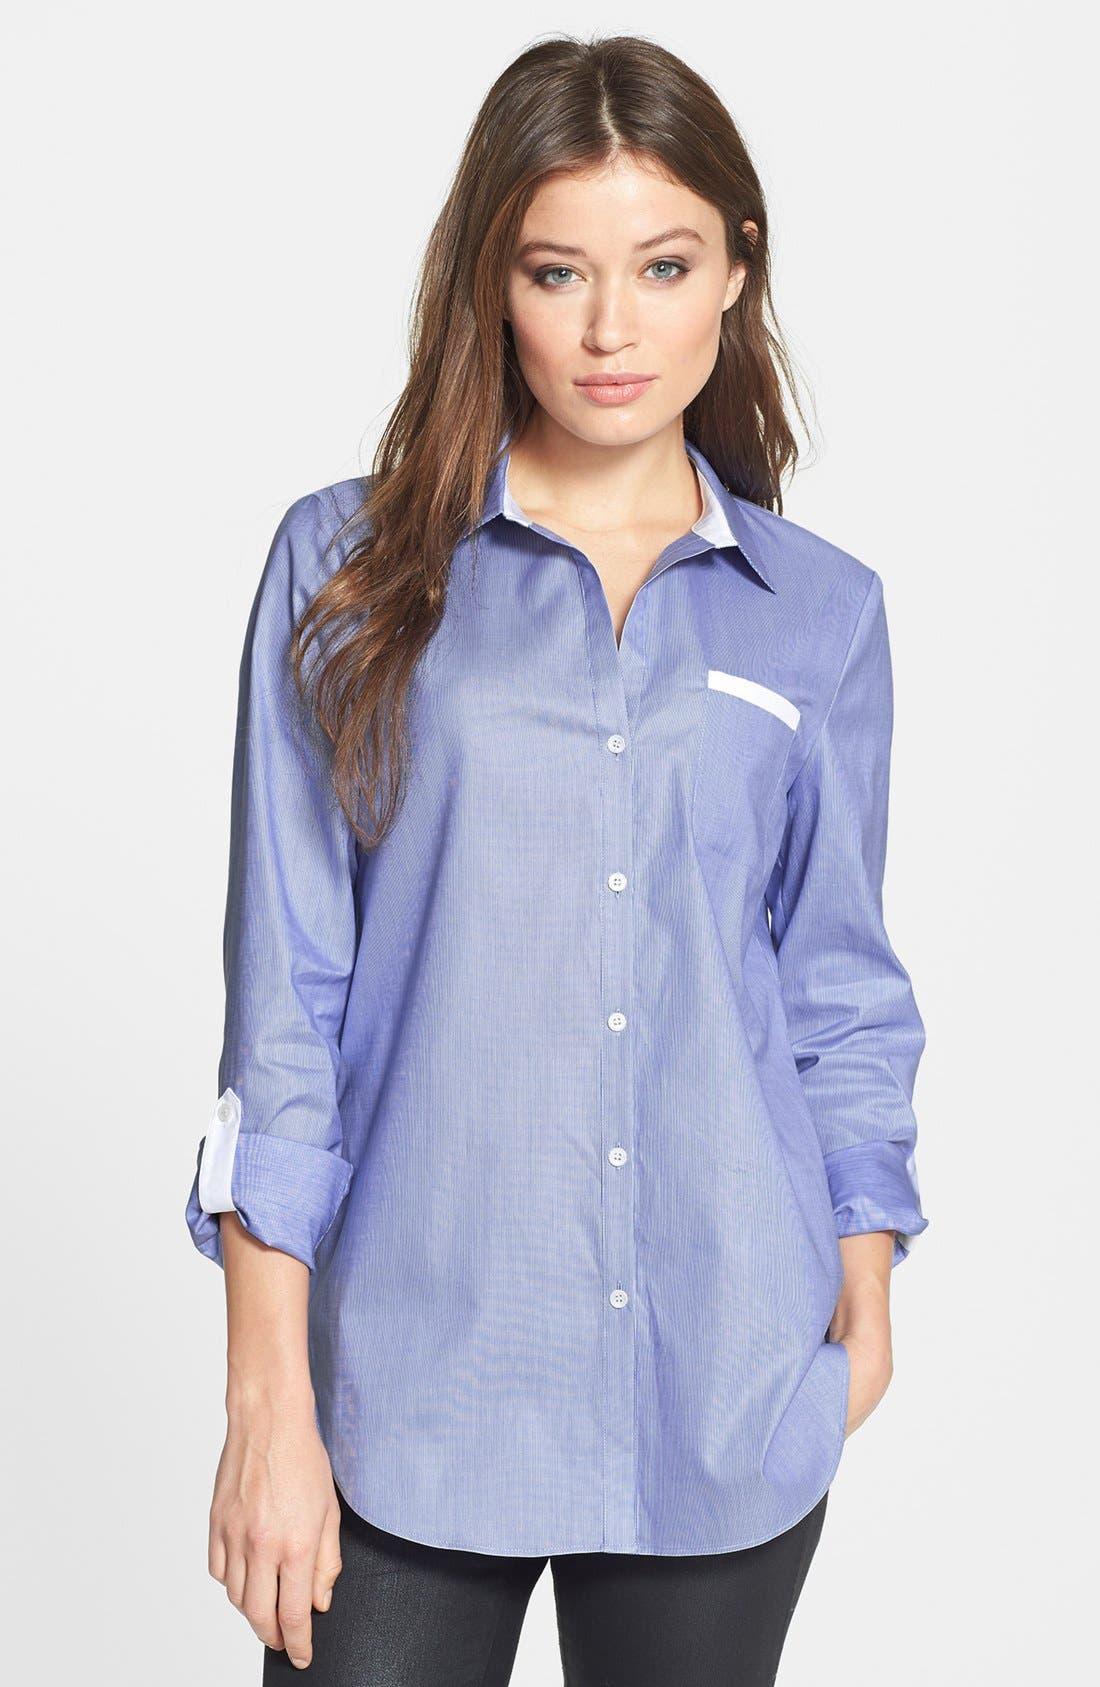 Alternate Image 1 Selected - Lafayette 148 New York 'Piano Stripe' Roll Sleeve Cotton Shirt